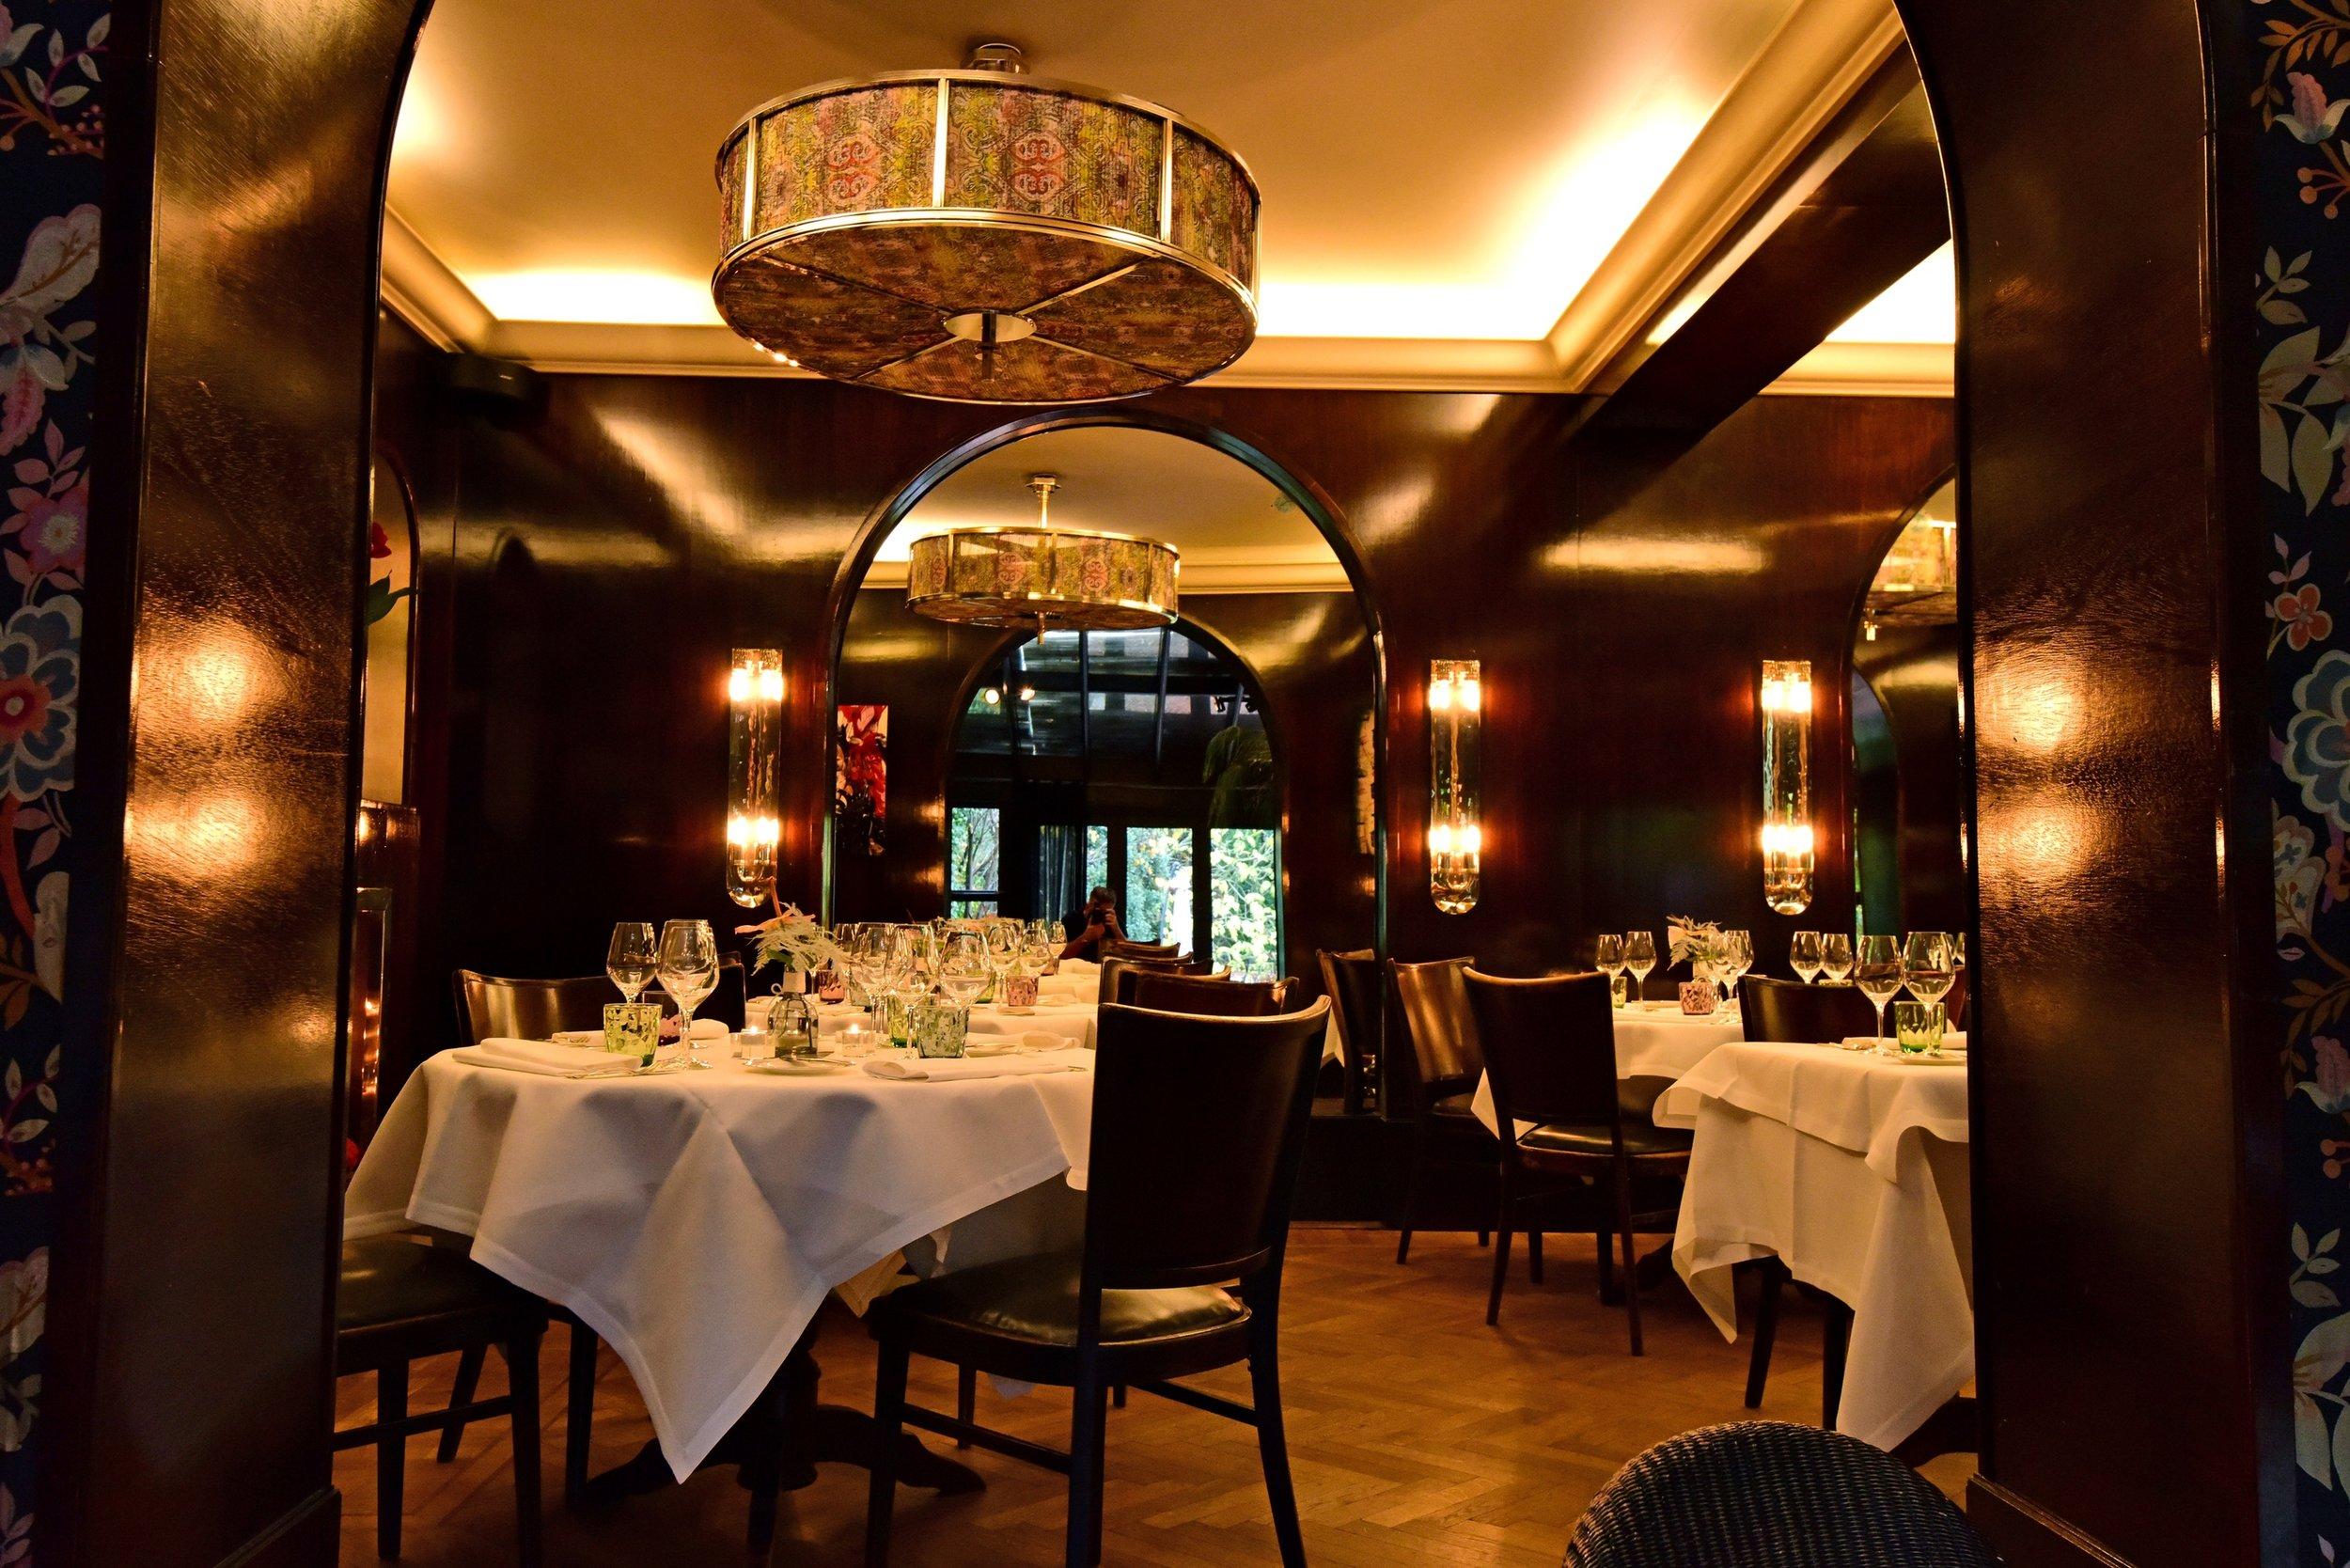 12 restaurant de mangerie lauwe tablefever bart albrecht .jpg